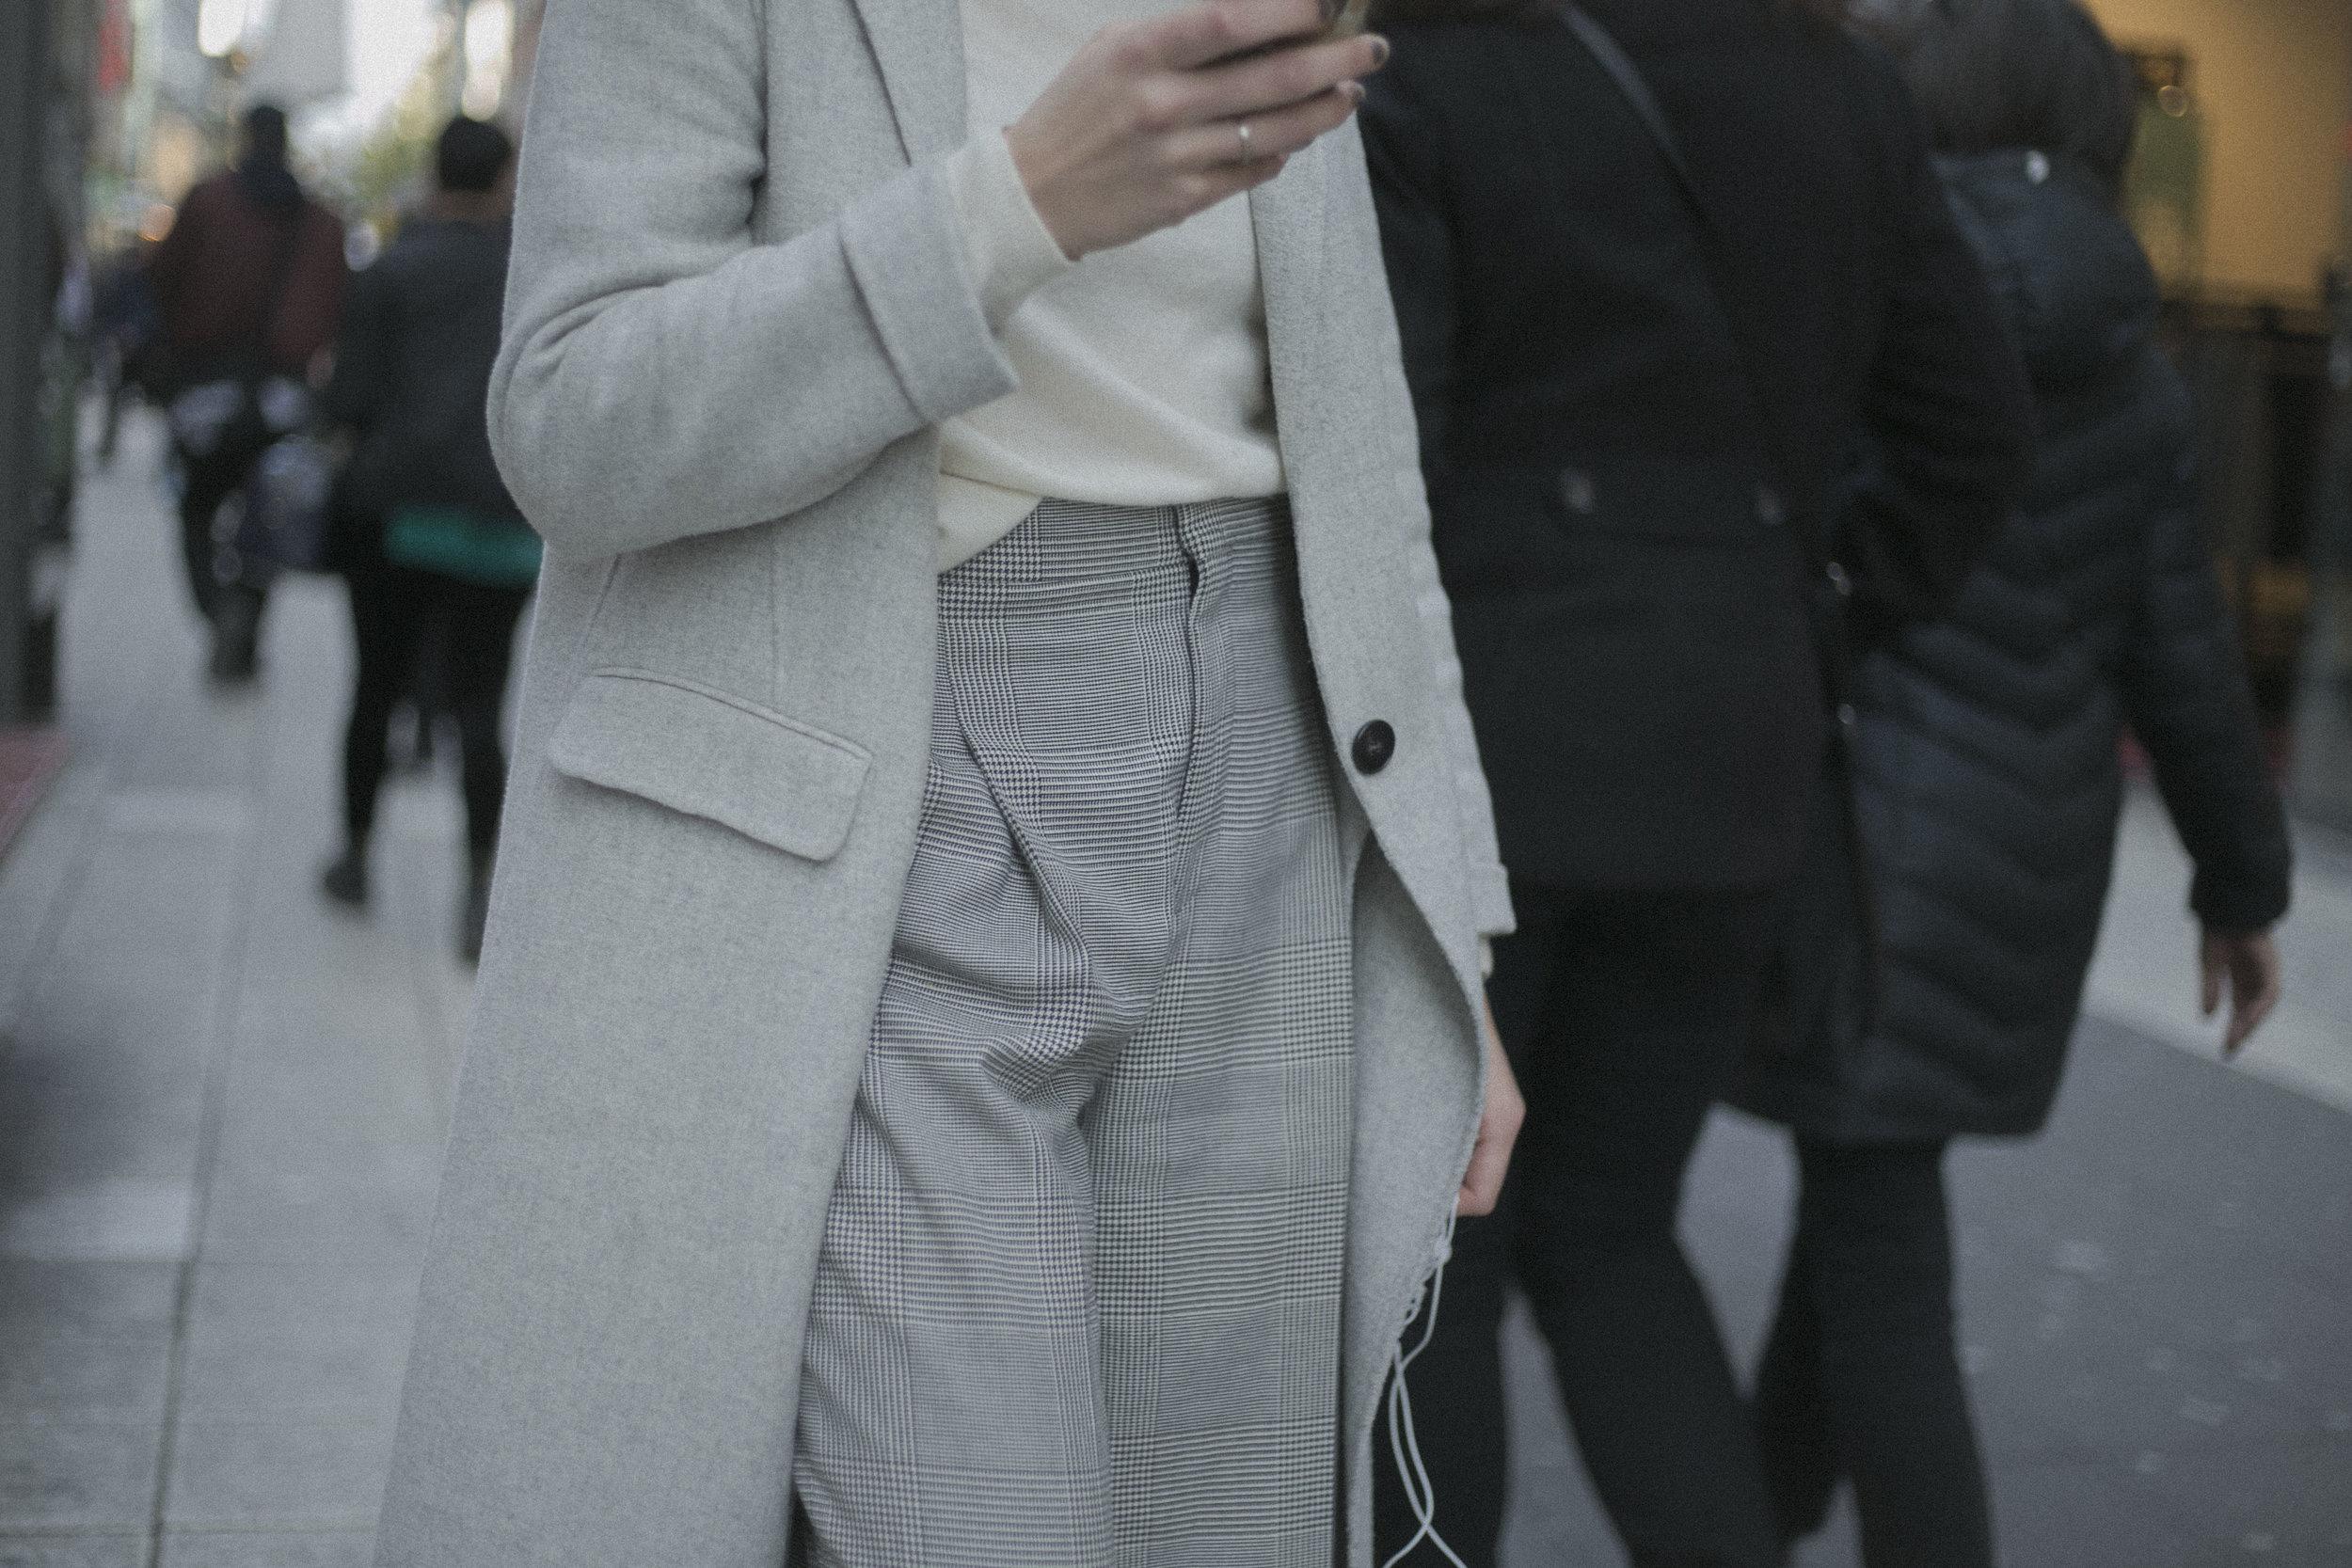 street-style-Stockholm-sweden-fashion-streetstyle-blog-onthestreets-thestreetland-portraits-fashionweek-elegant-style-